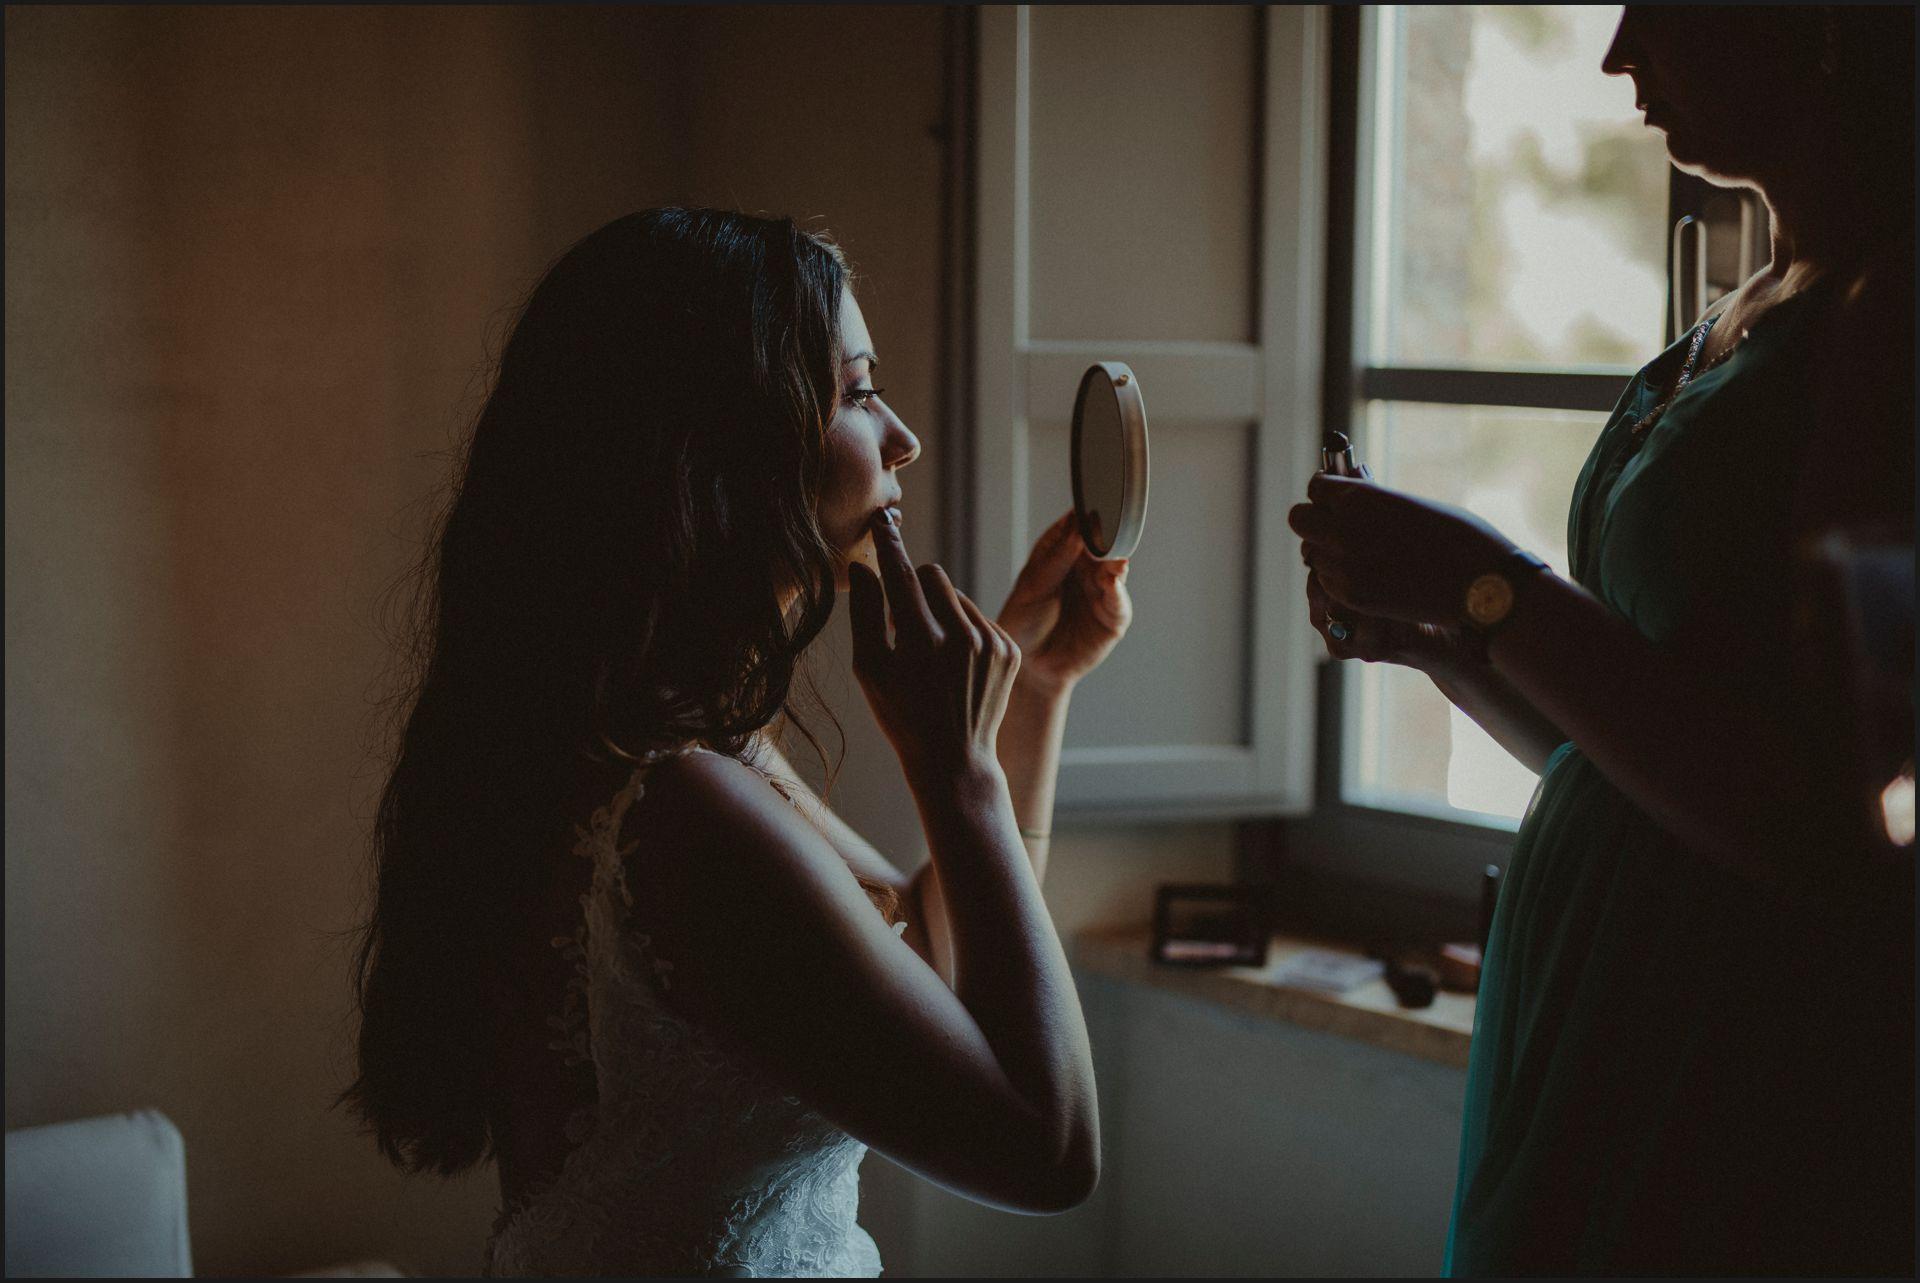 bride, wedding dress, getting ready, wedding, umbria, make up